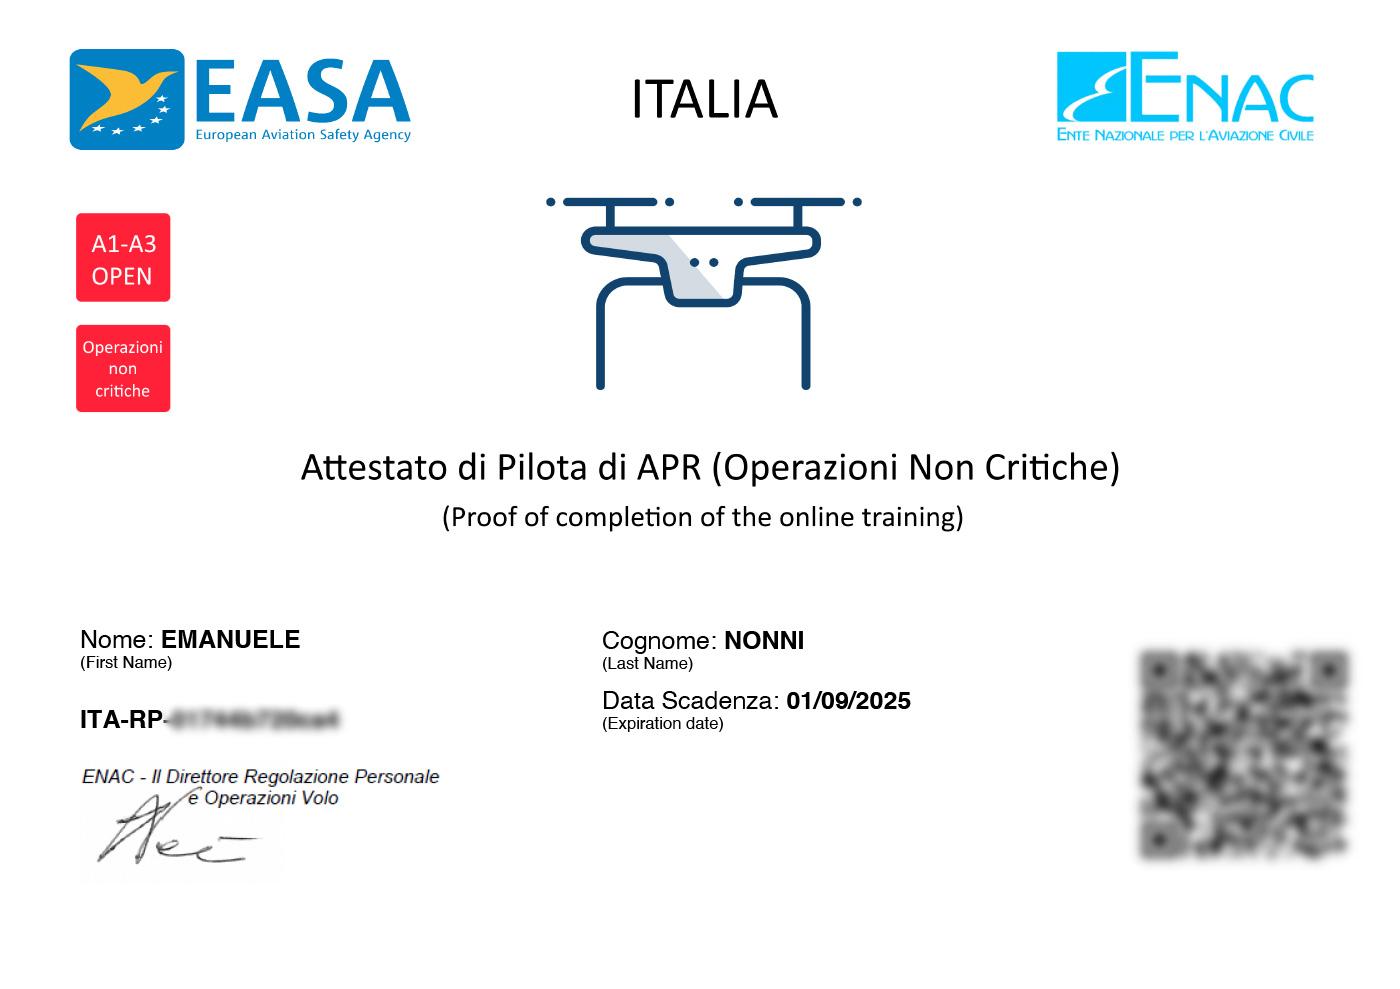 Attestato Pilota APRITA-RP - Emanuele Nonni